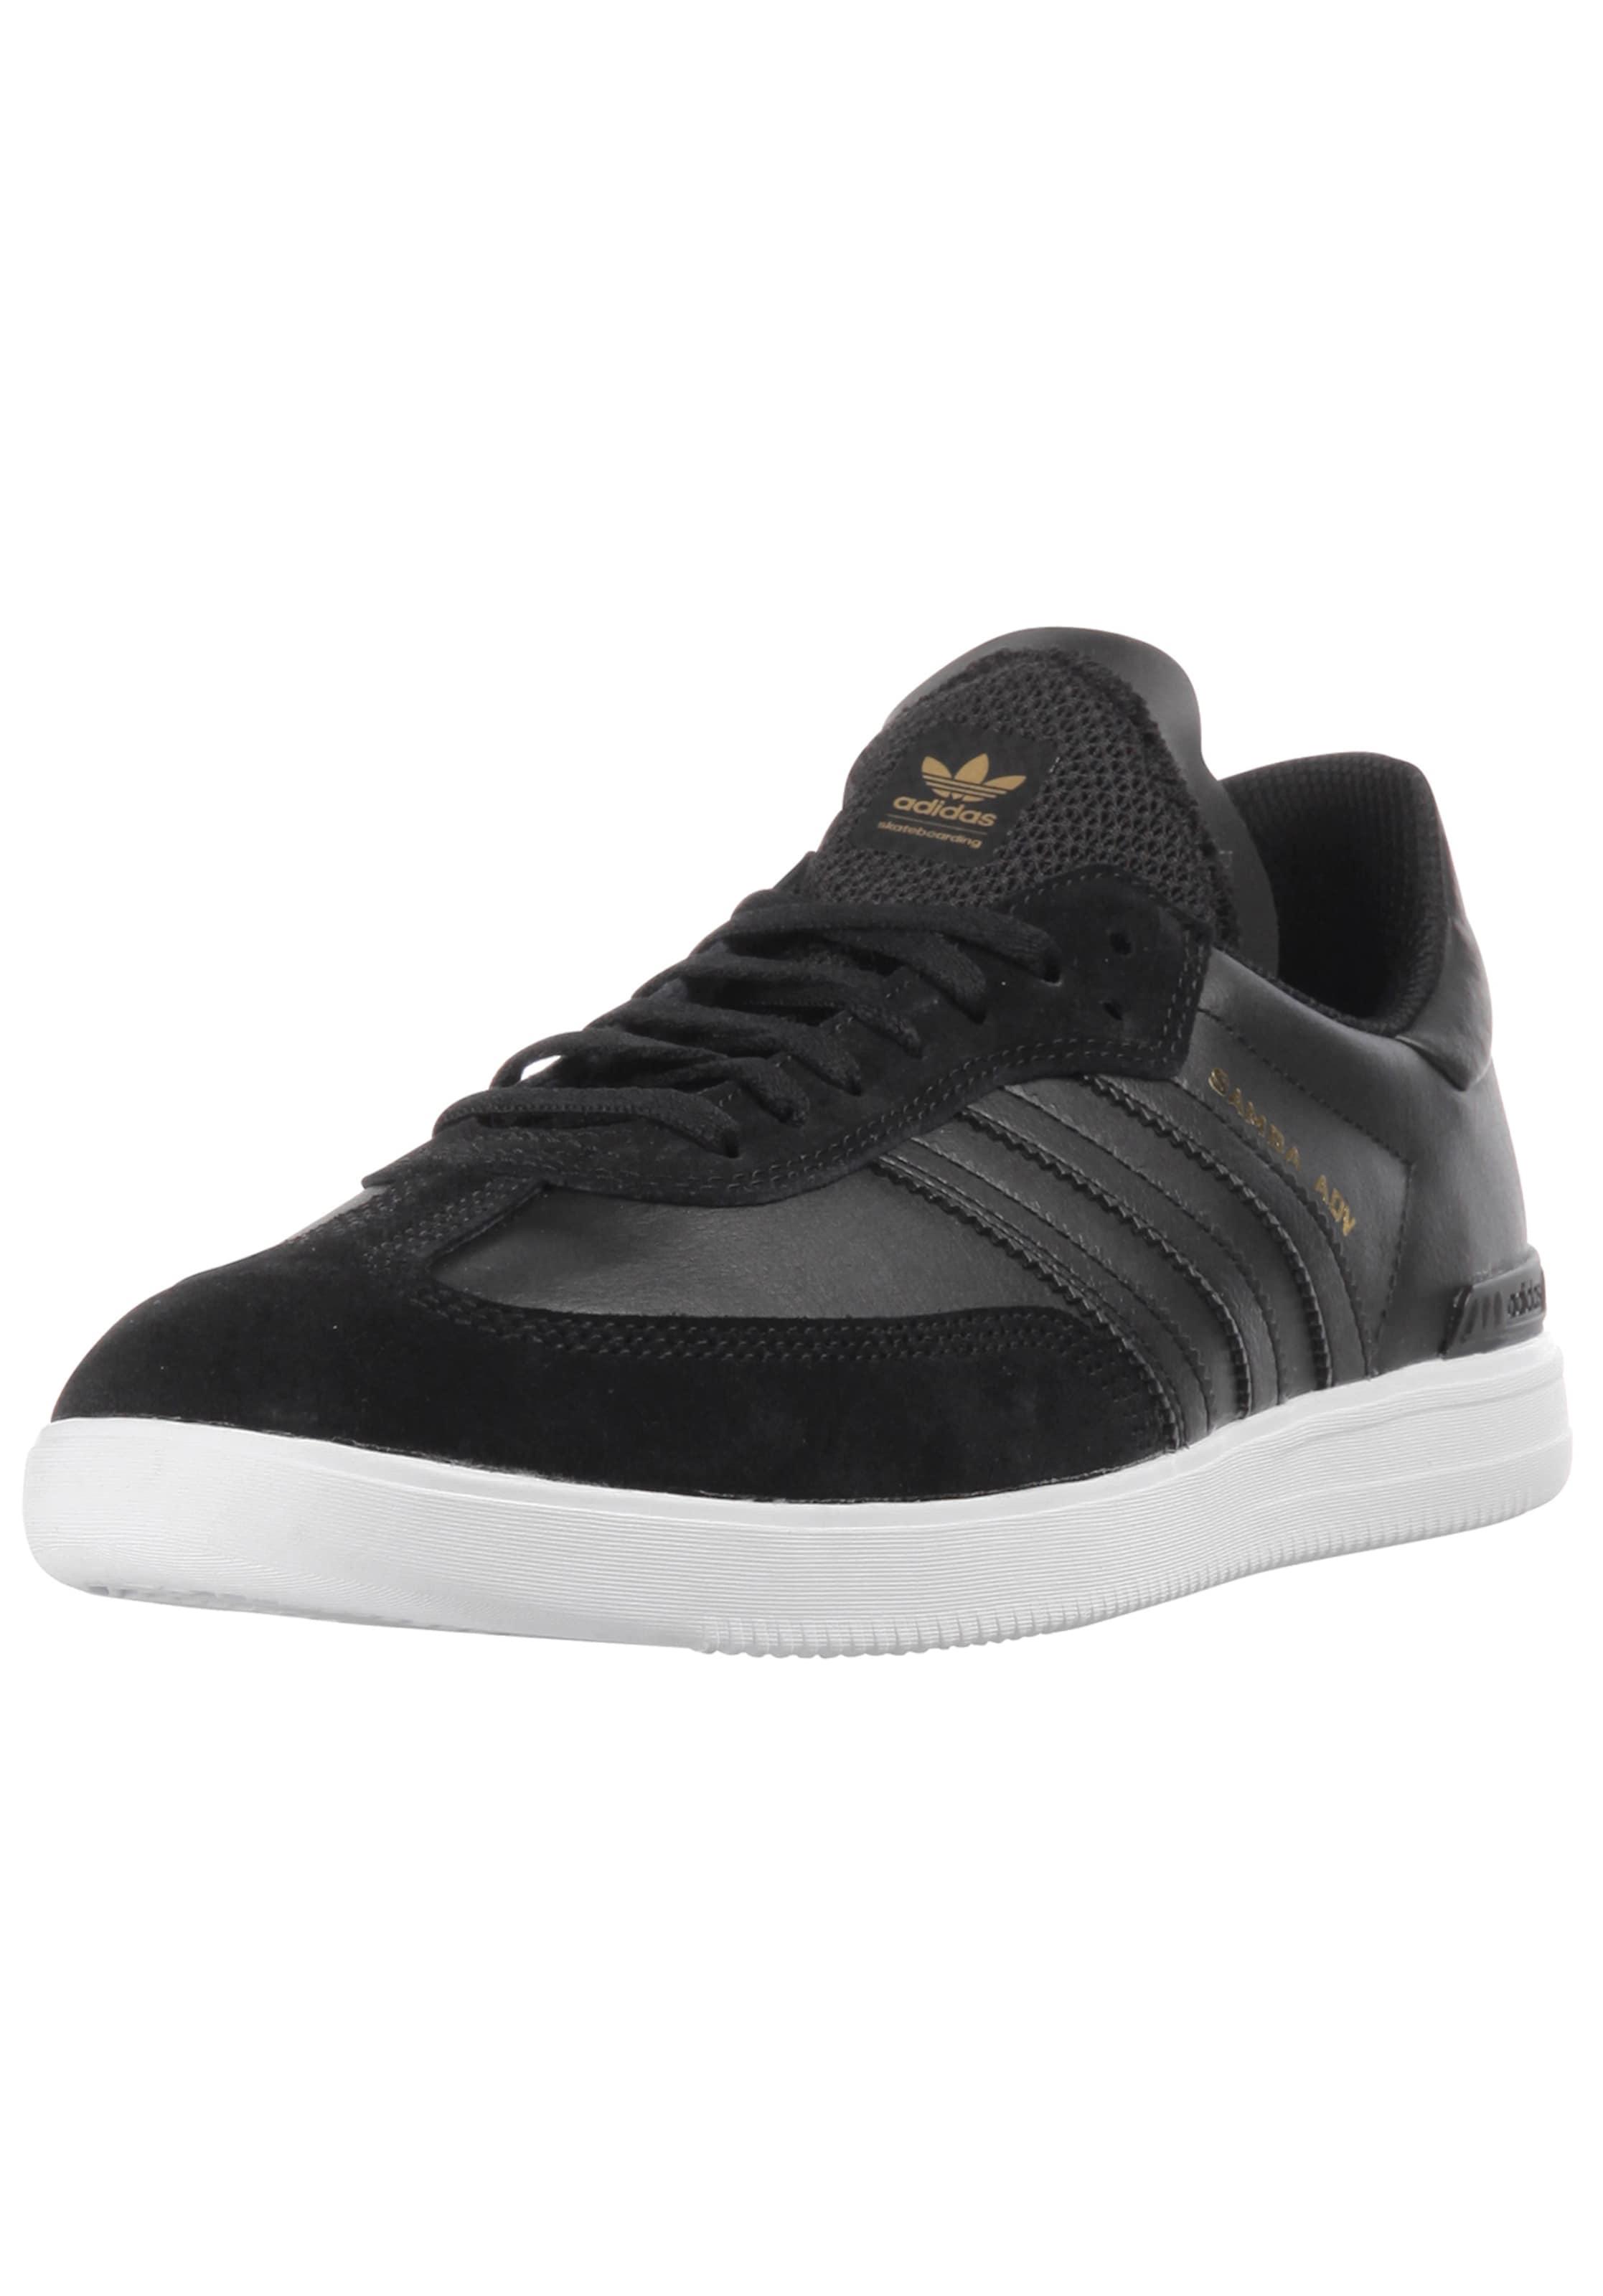 ADIDAS ORIGINALS Sneaker Samba Adv Hohe Qualität